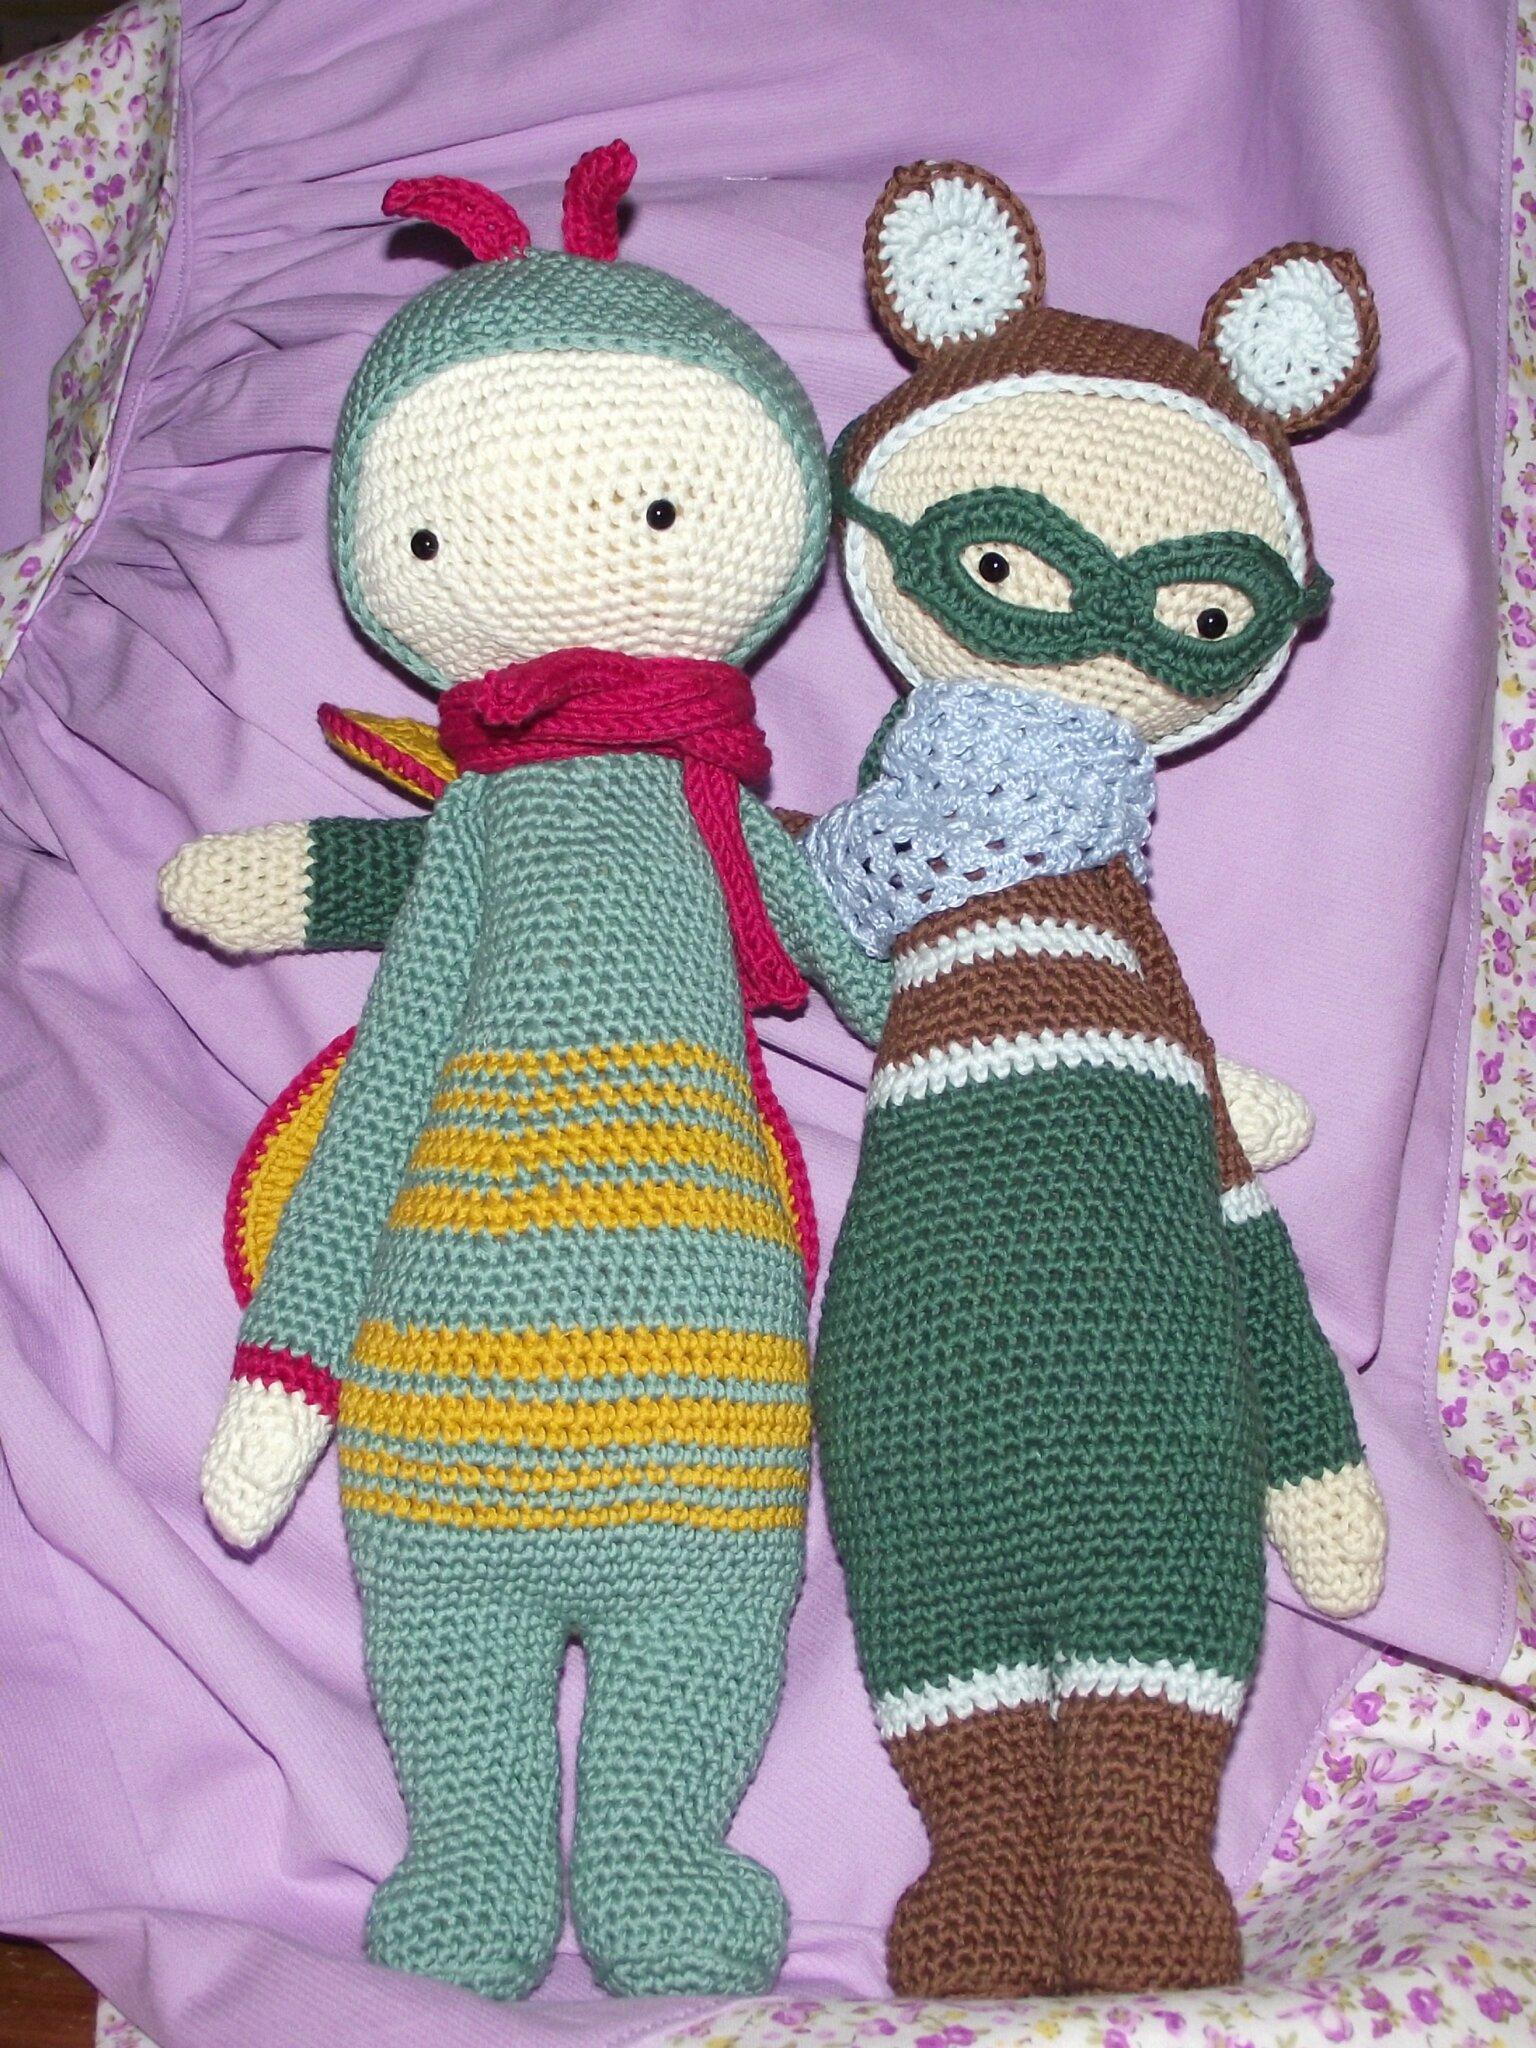 Buzz & Roco